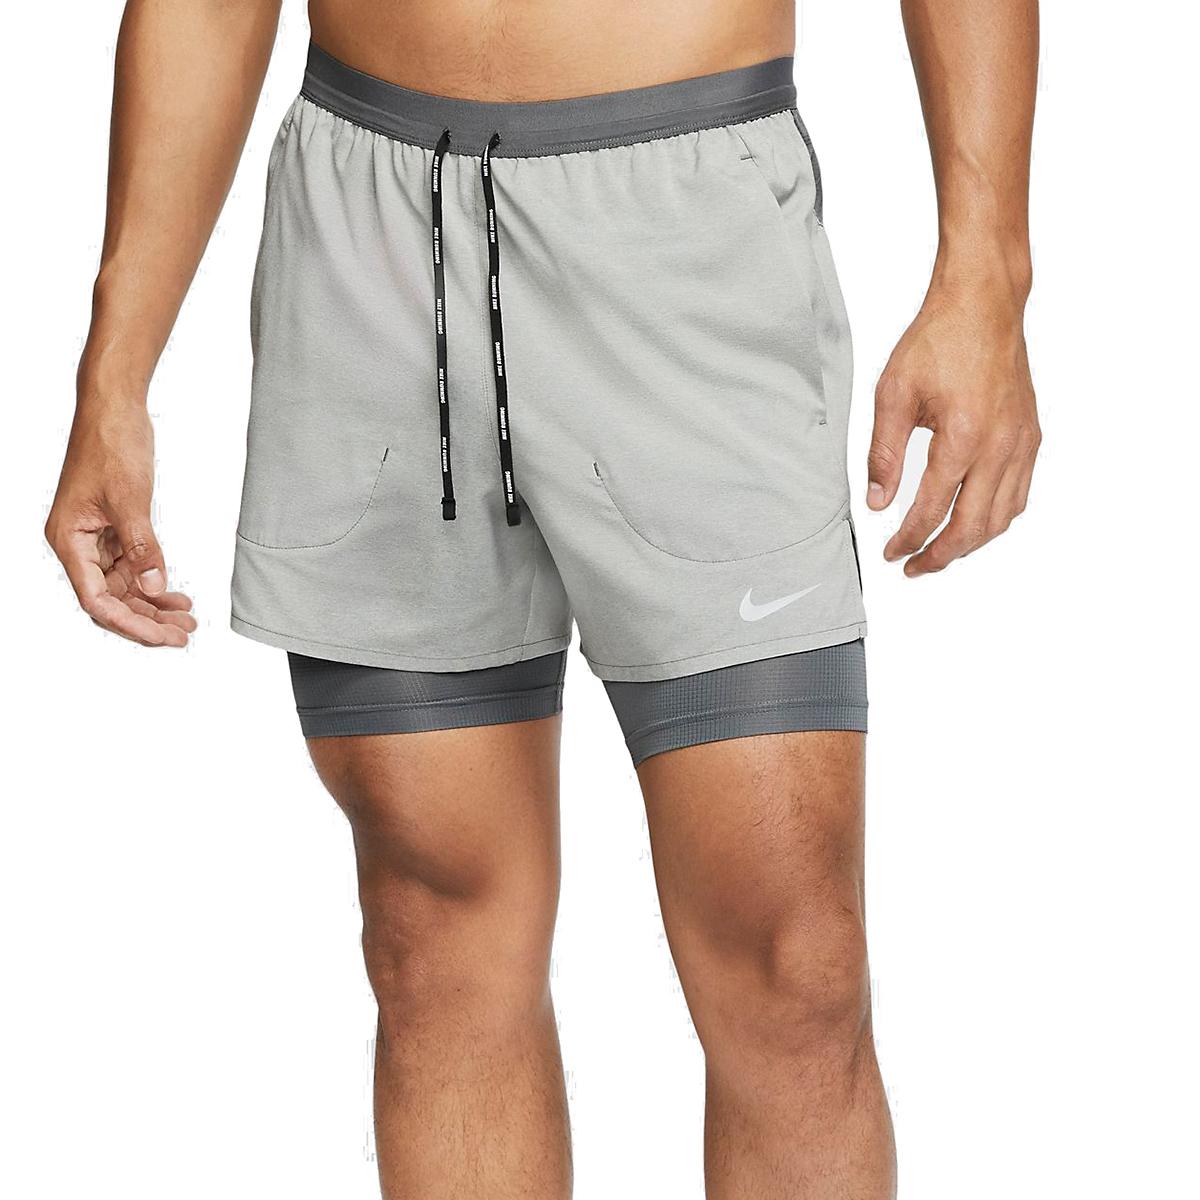 "Men's Nike Men's Flex Stride 5"" 2-in-1 Short - Color: Iron Grey/ Heather/Reflective Silver - Size: S, Iron Grey/ Heather/Reflective Silver, large, image 1"